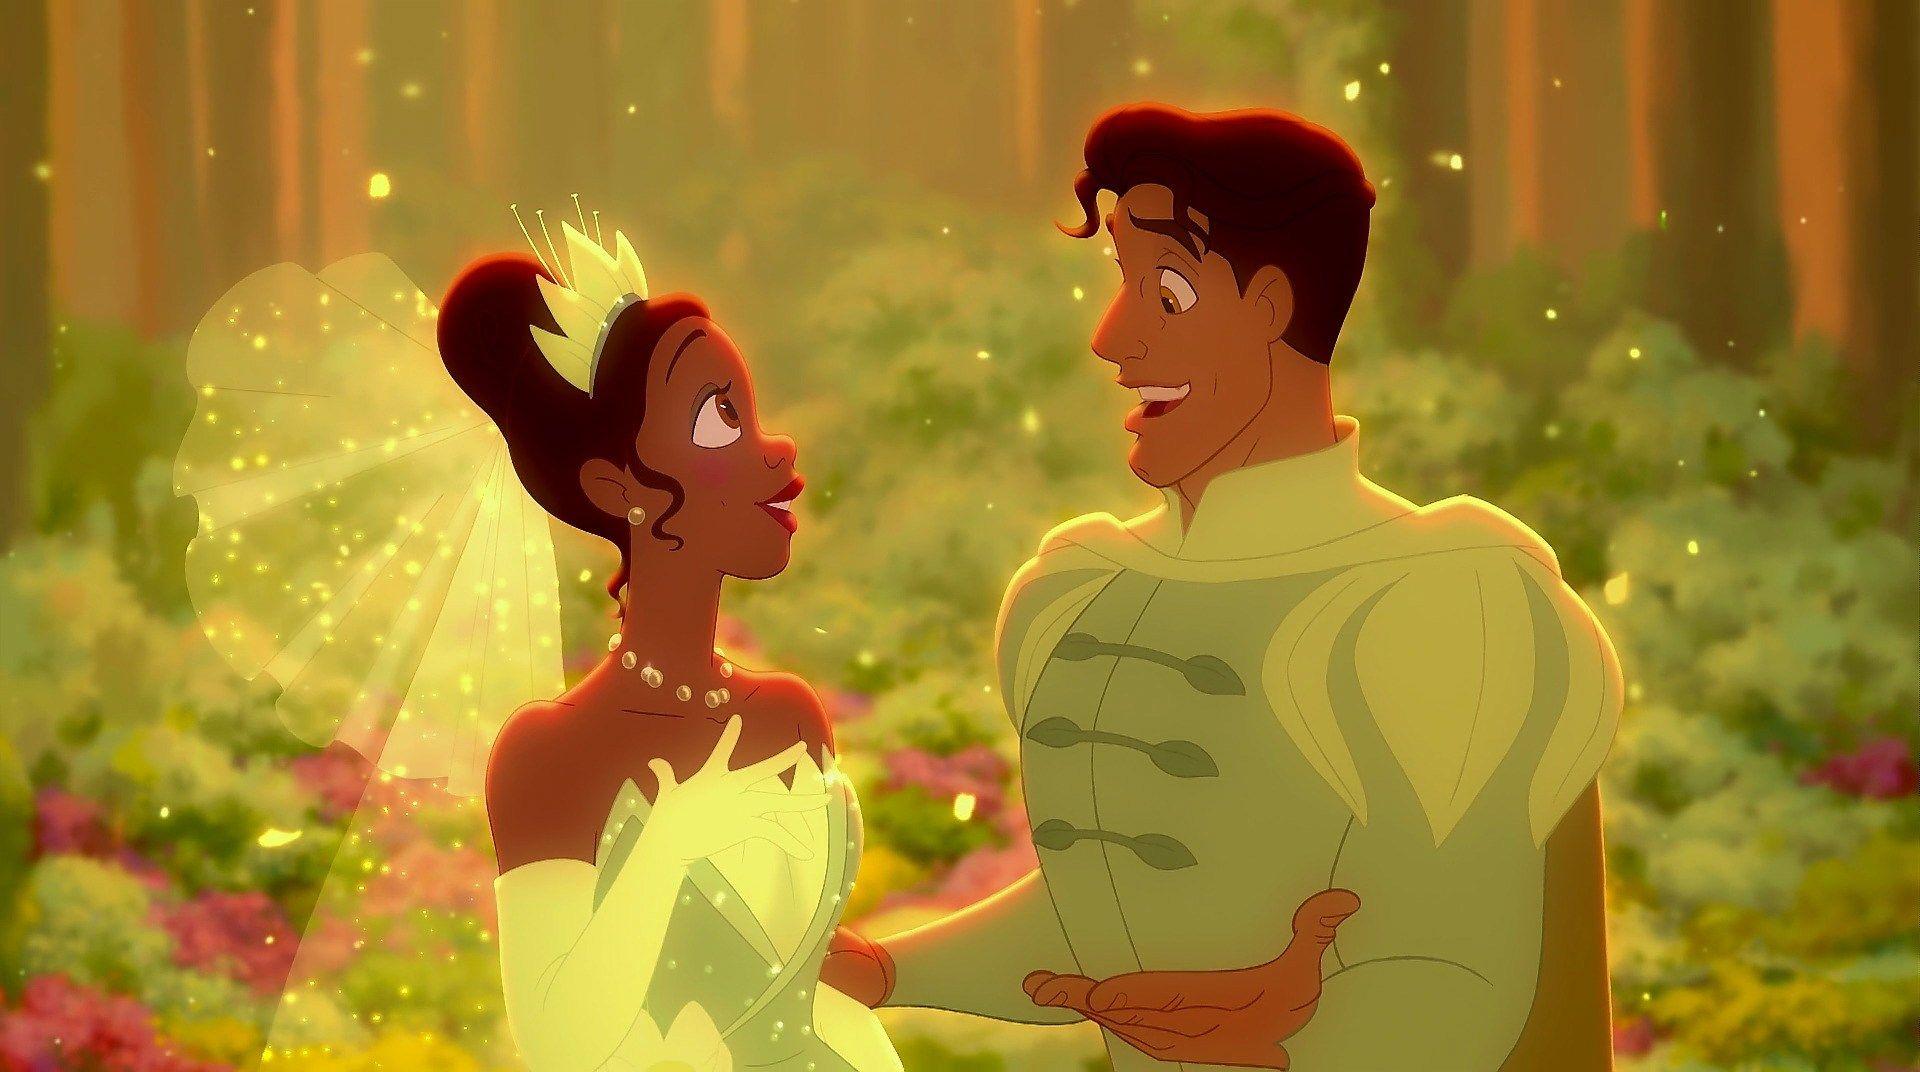 Pin by Ekc on Film Art Disney romance, Prince naveen